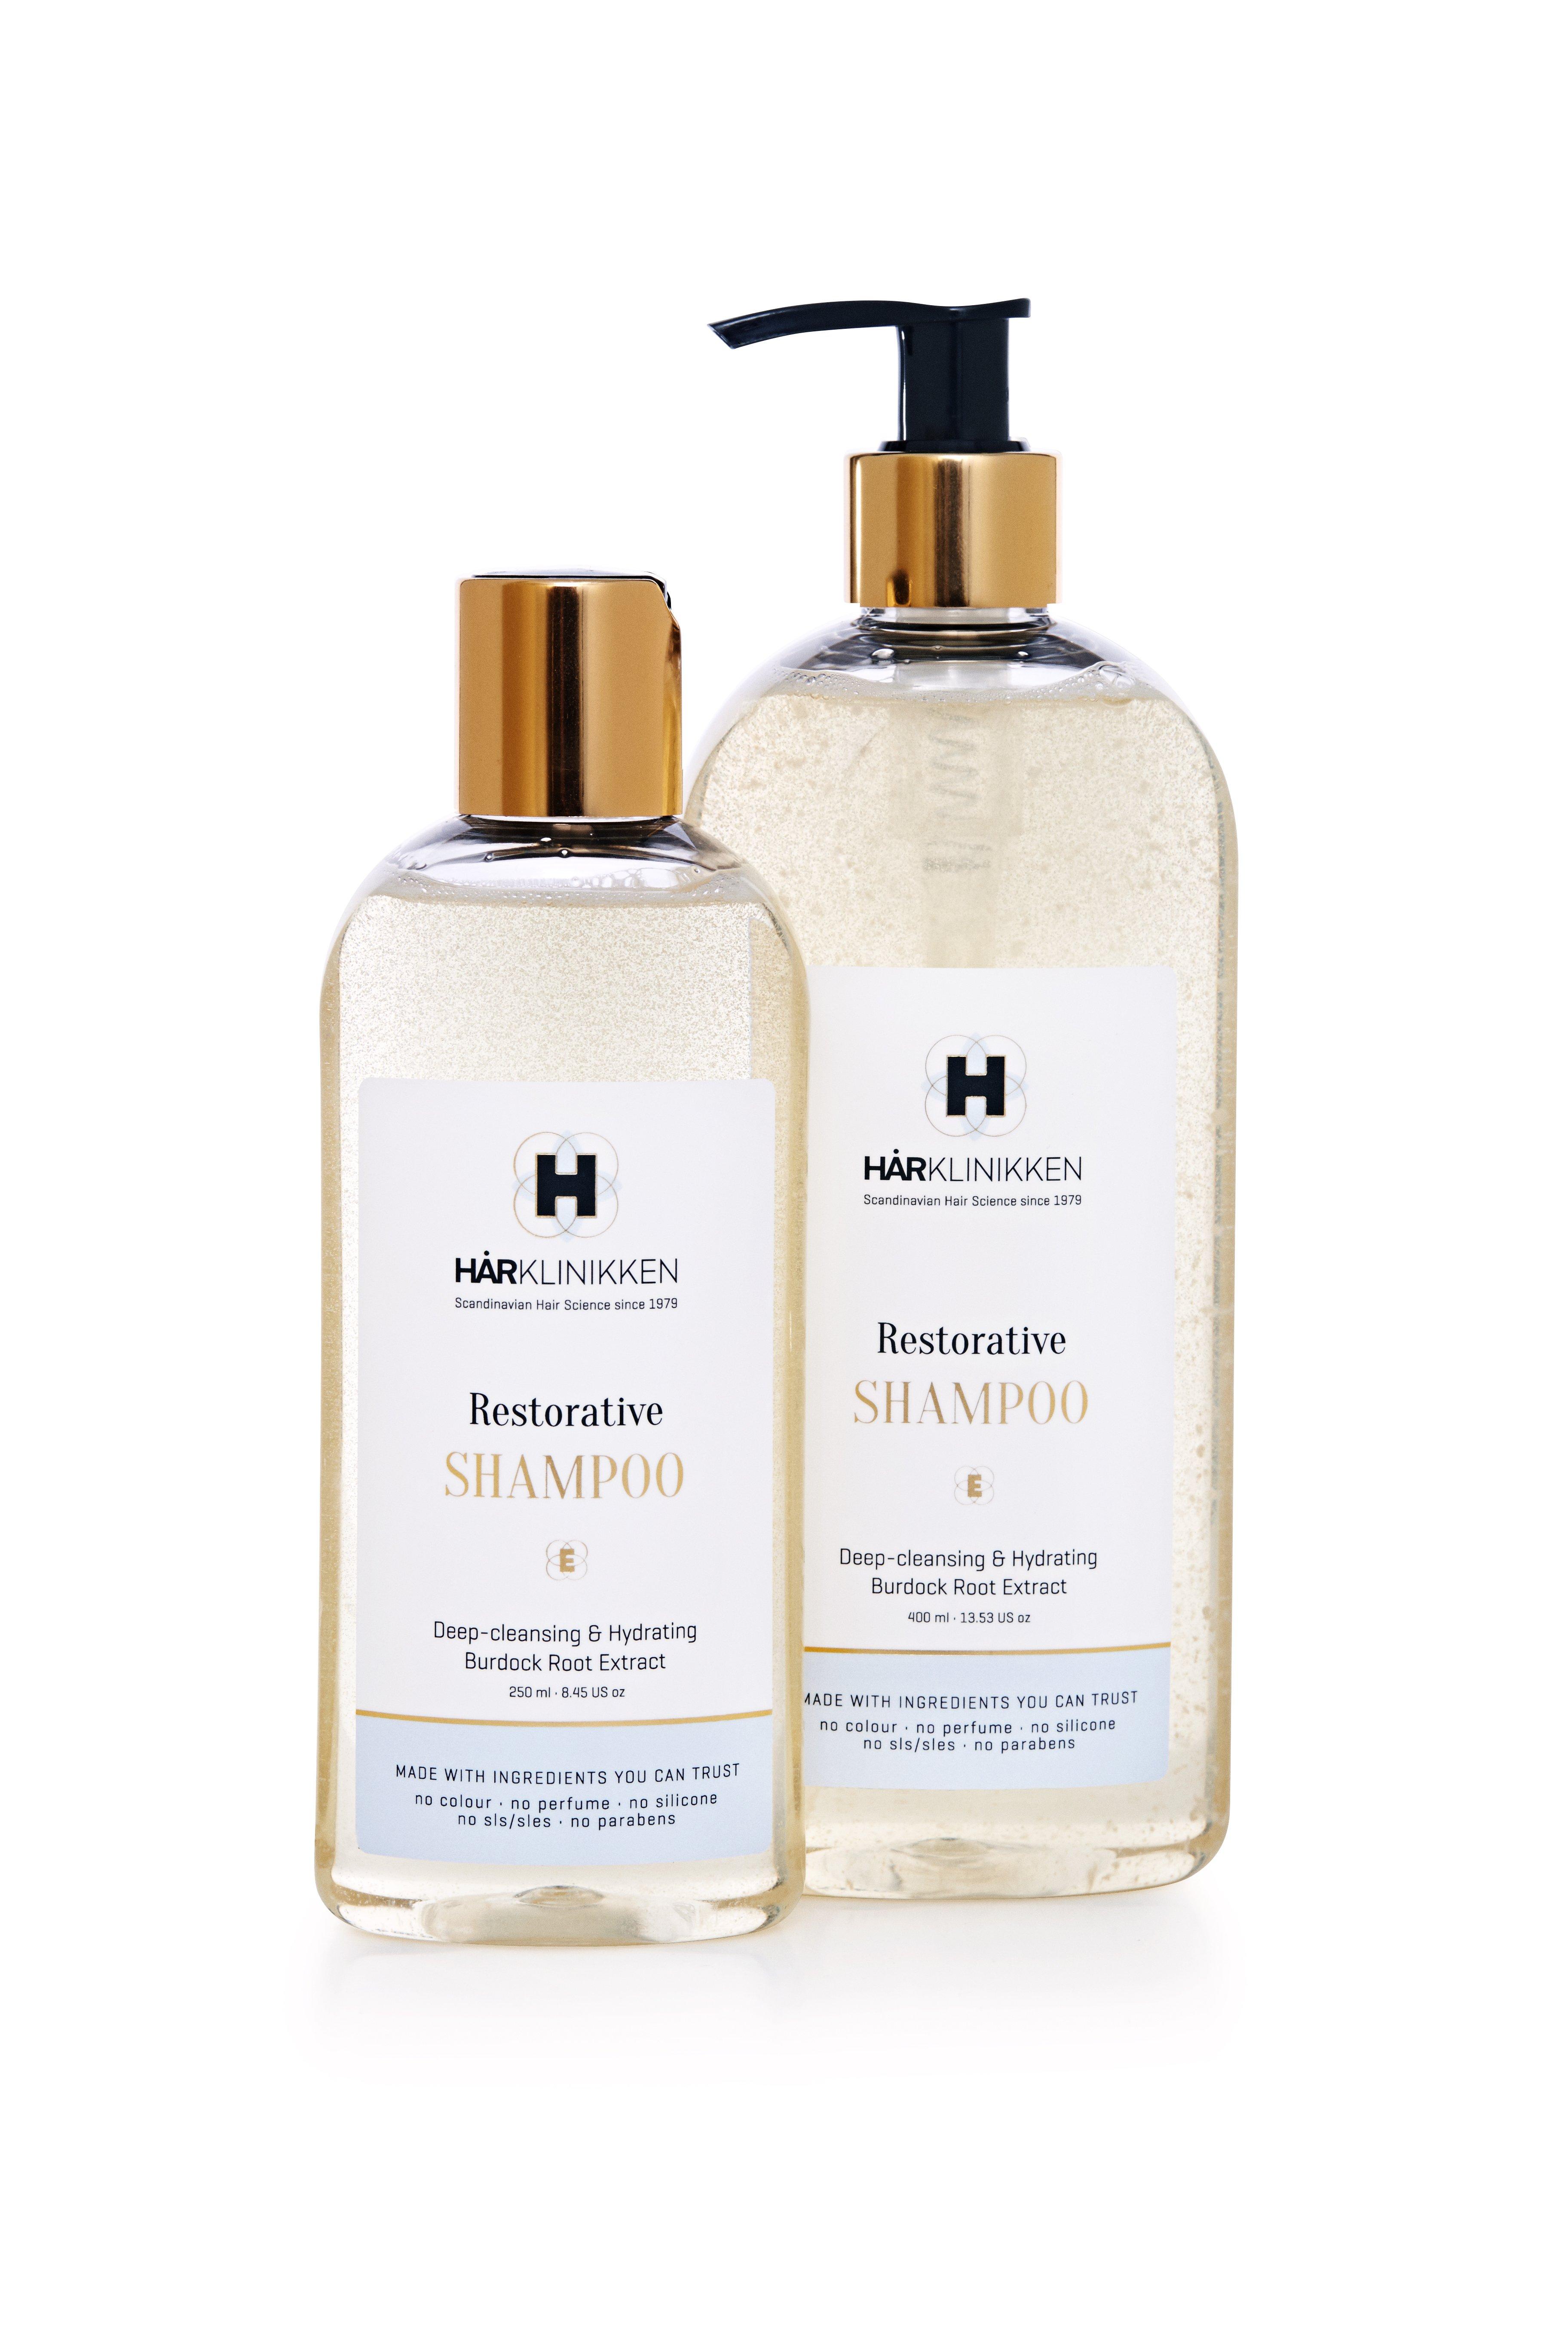 KM Tries Harklinikken Clinic's New Restorative Shampoo